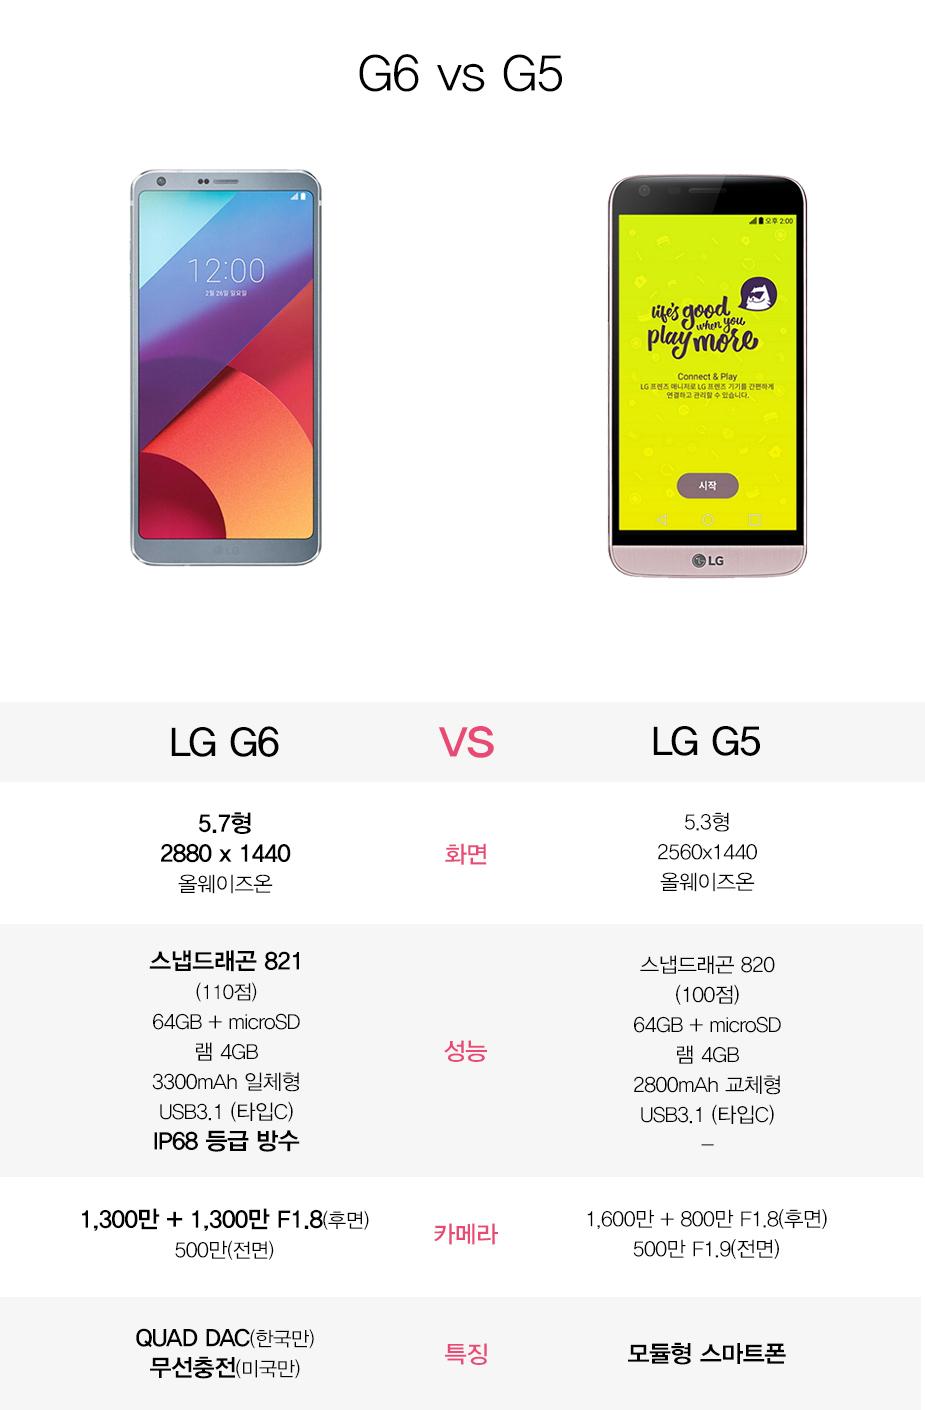 G6 vs G5